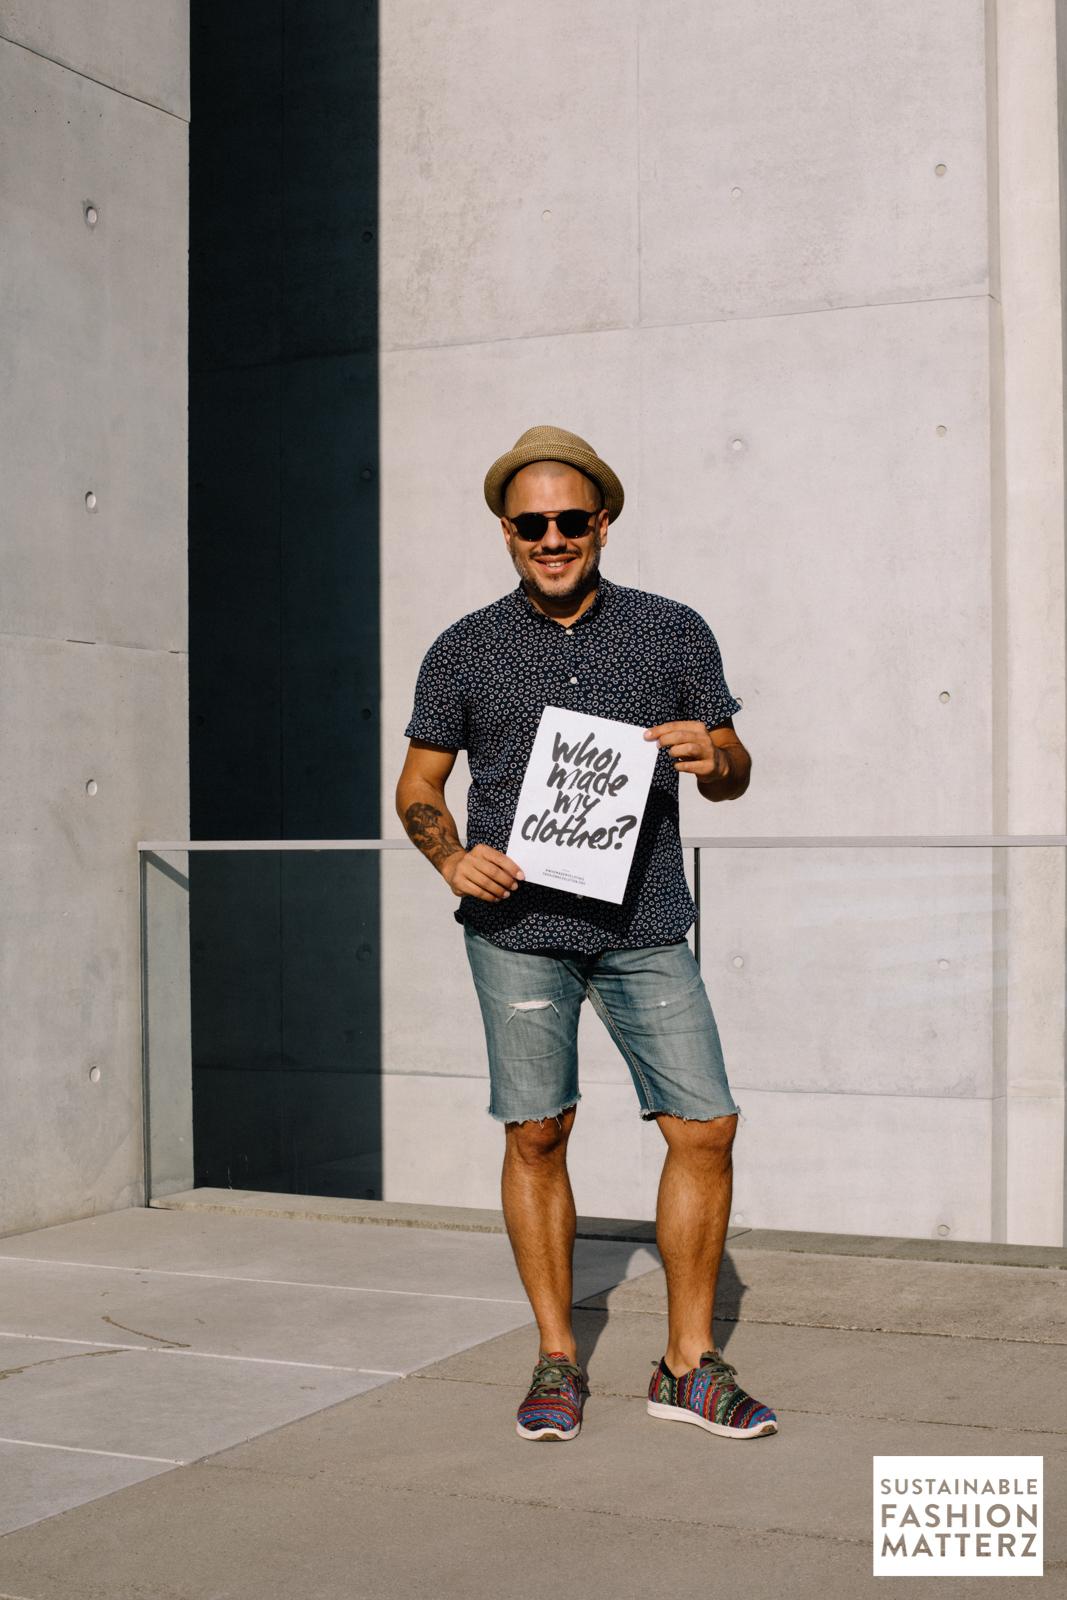 fashion-revolution-by-sustainable-fashion-matterz-97.jpg